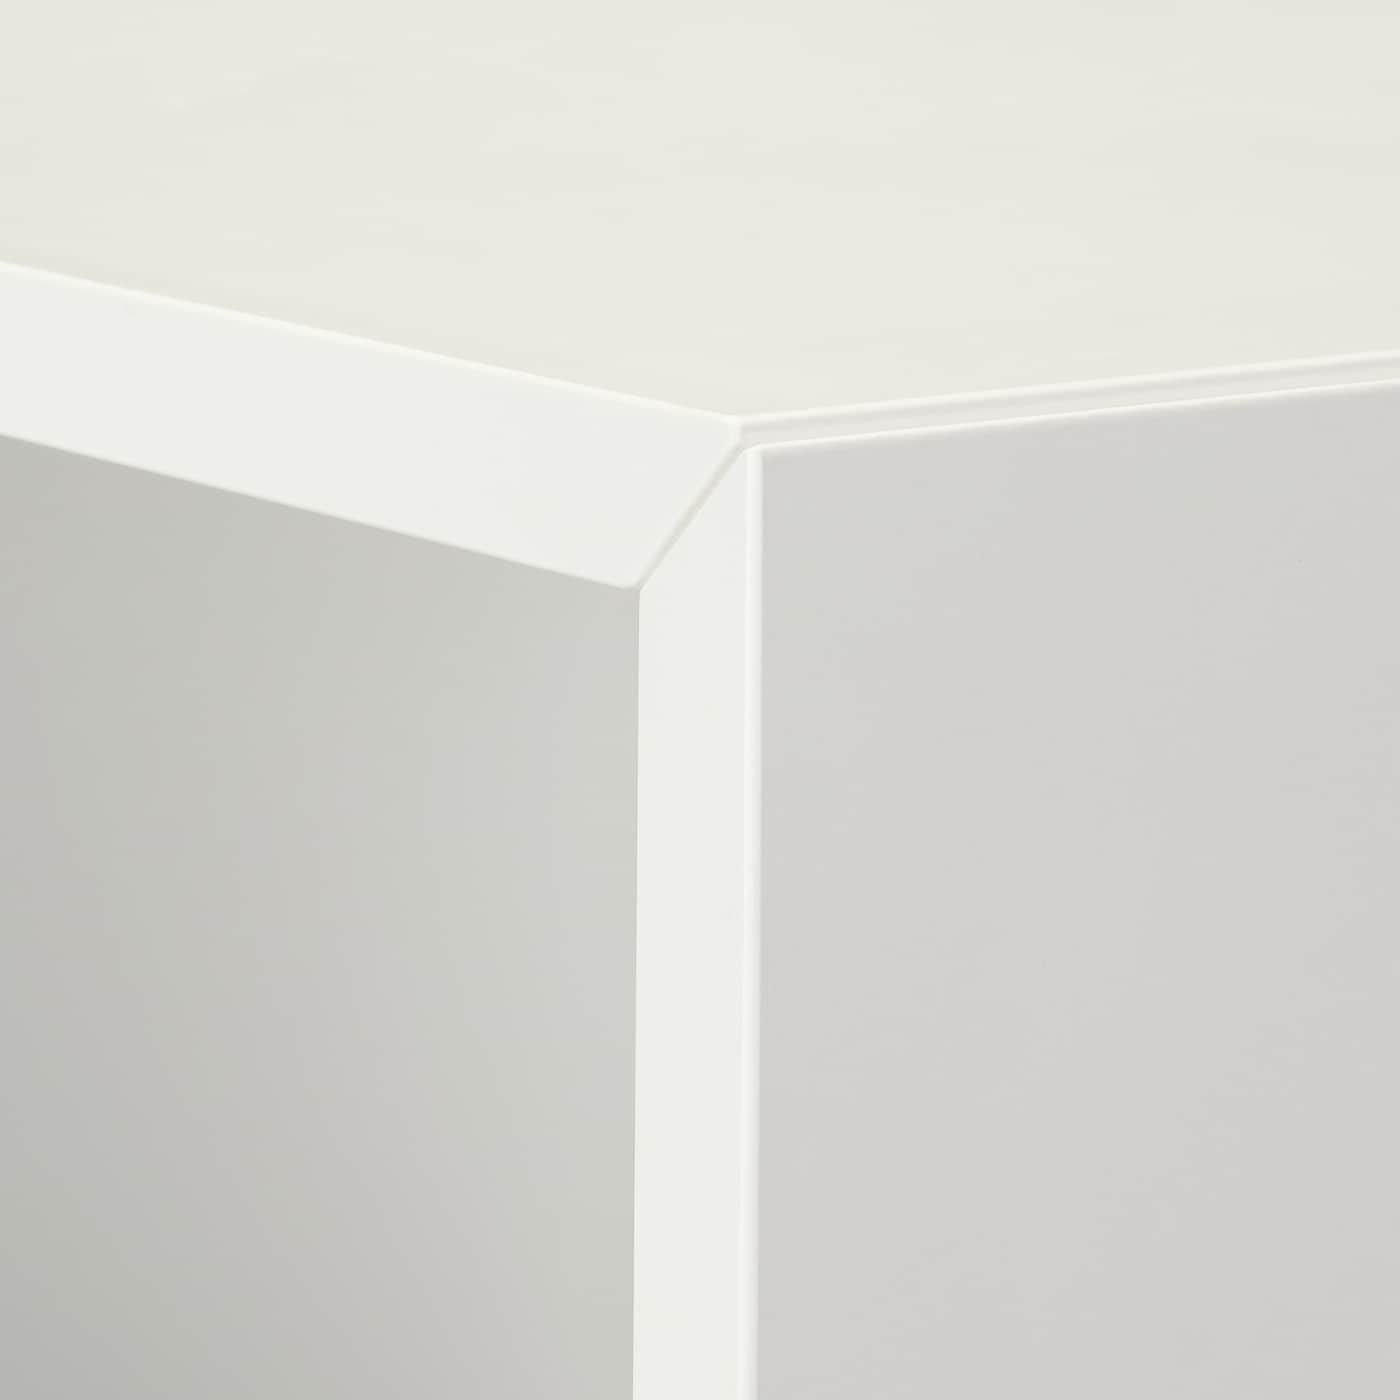 EKET Cabinet combination with feet, white/dark grey/light grey, 105x35x107 cm